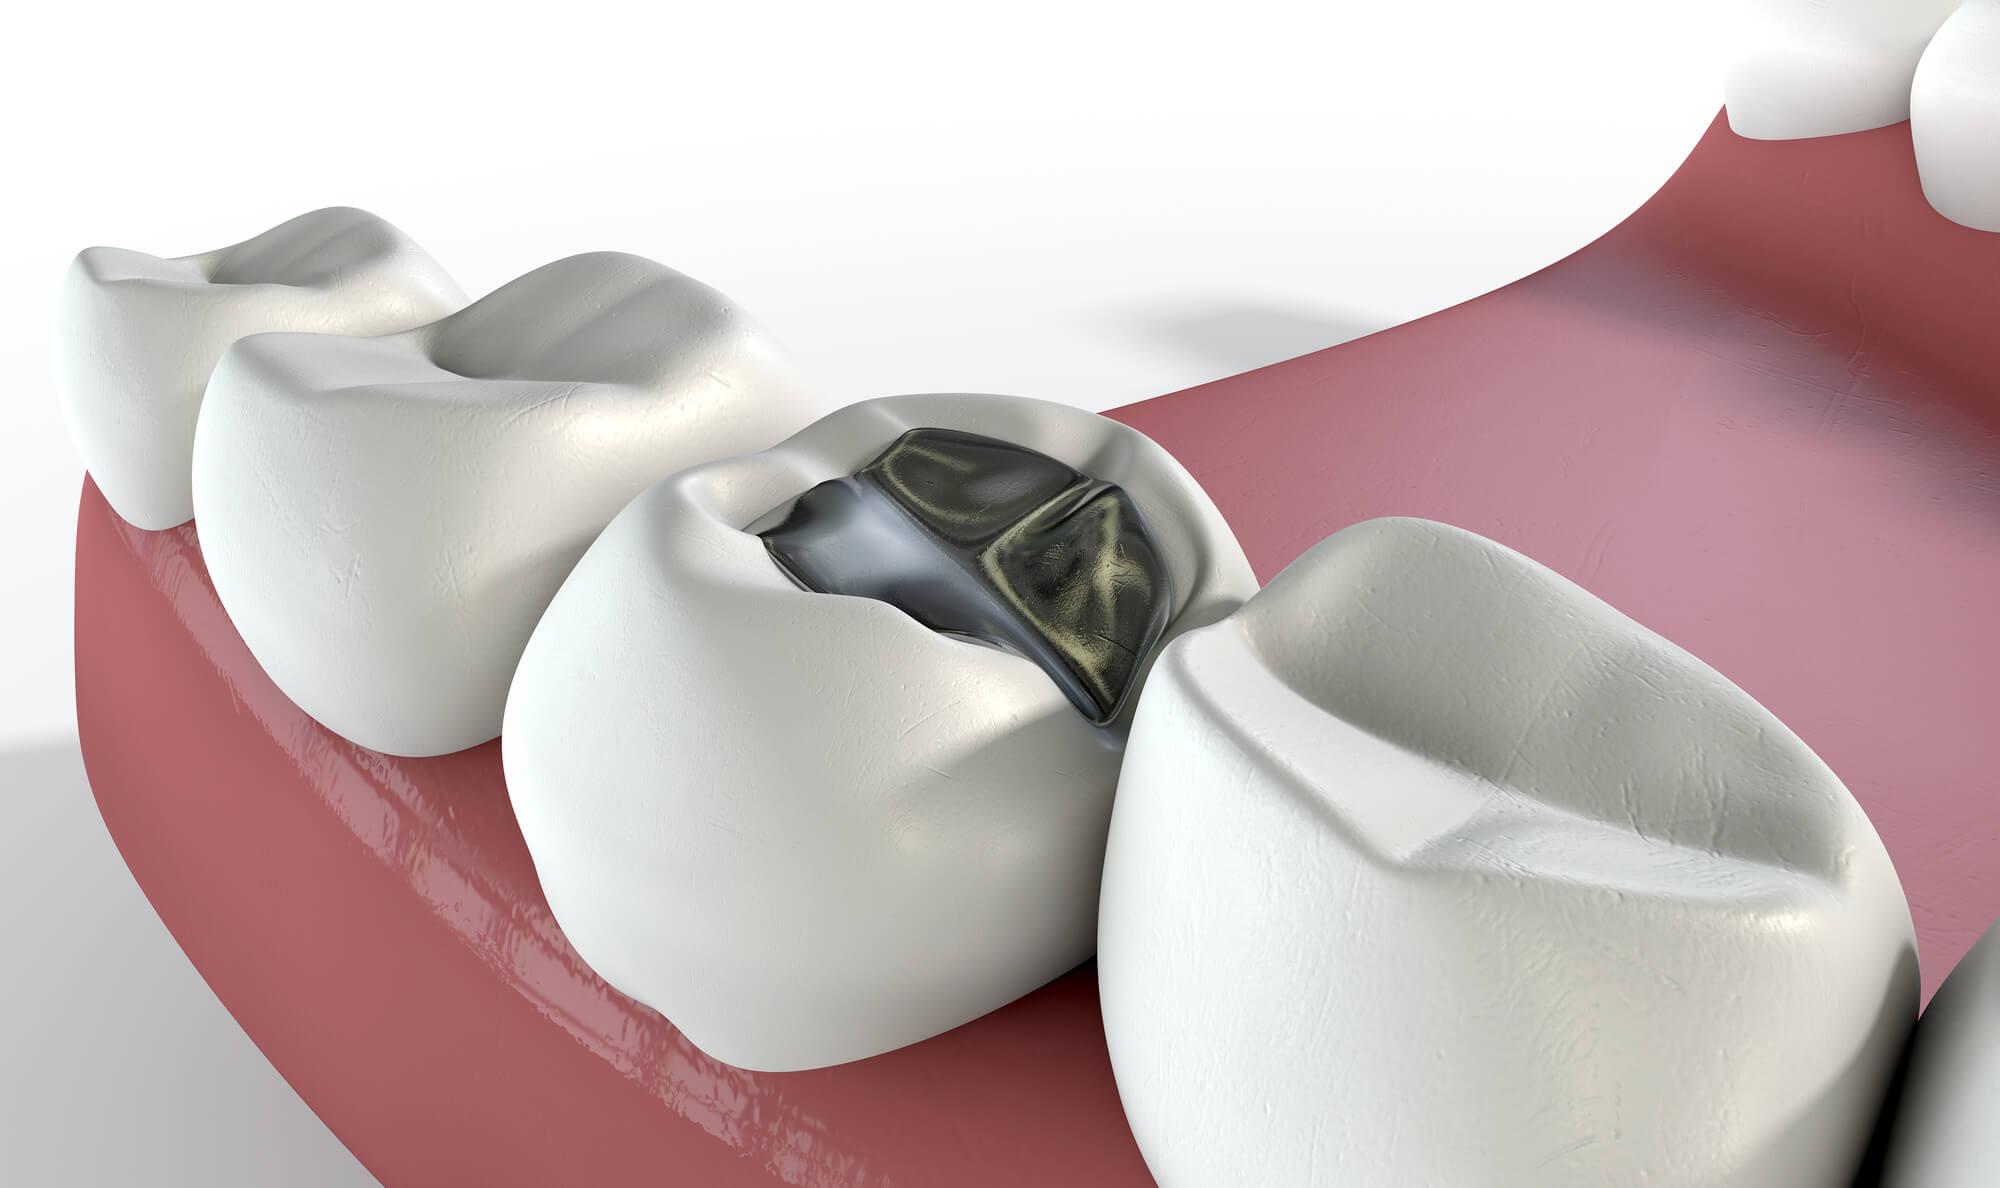 A model of dental fillingsin conroe